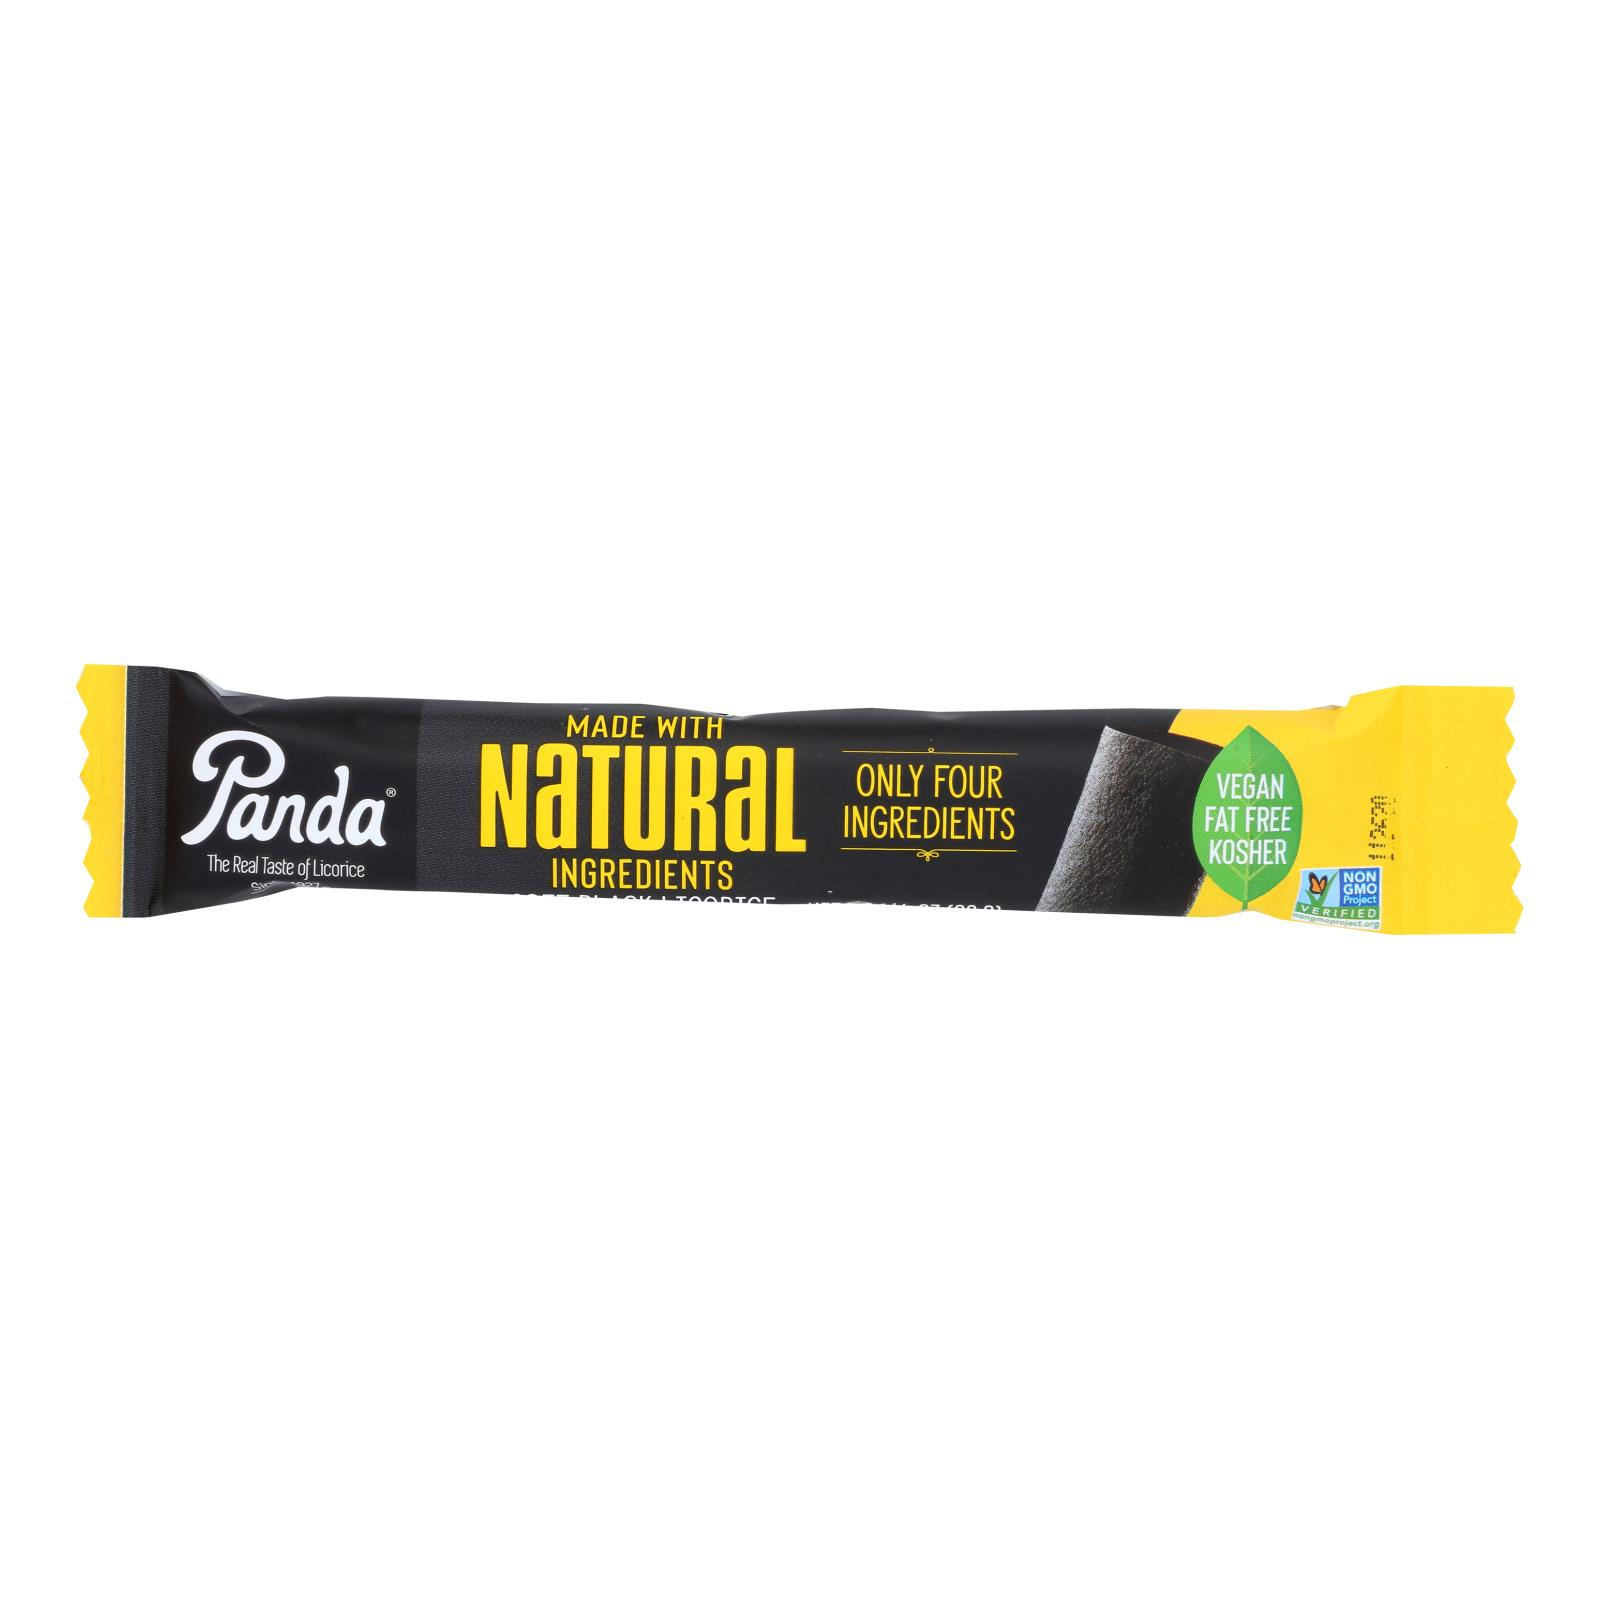 Panda Licorice Bars - Natural - Case of 36 - 1.125 oz